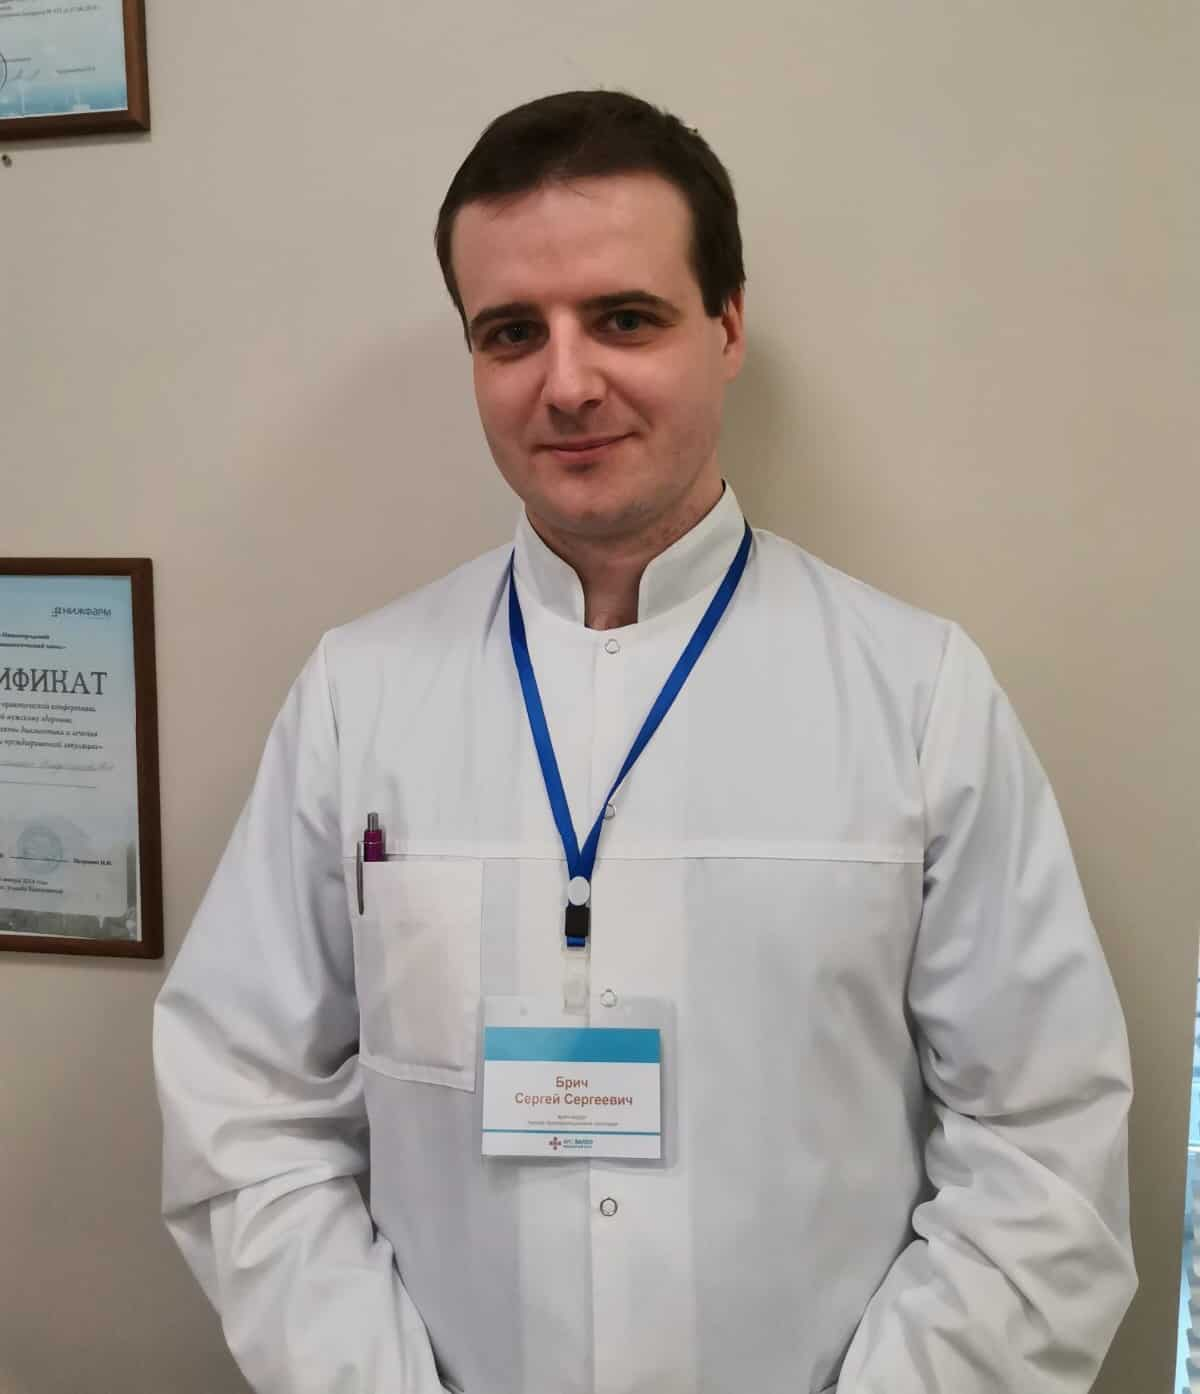 Брич Сергей Сергеевич